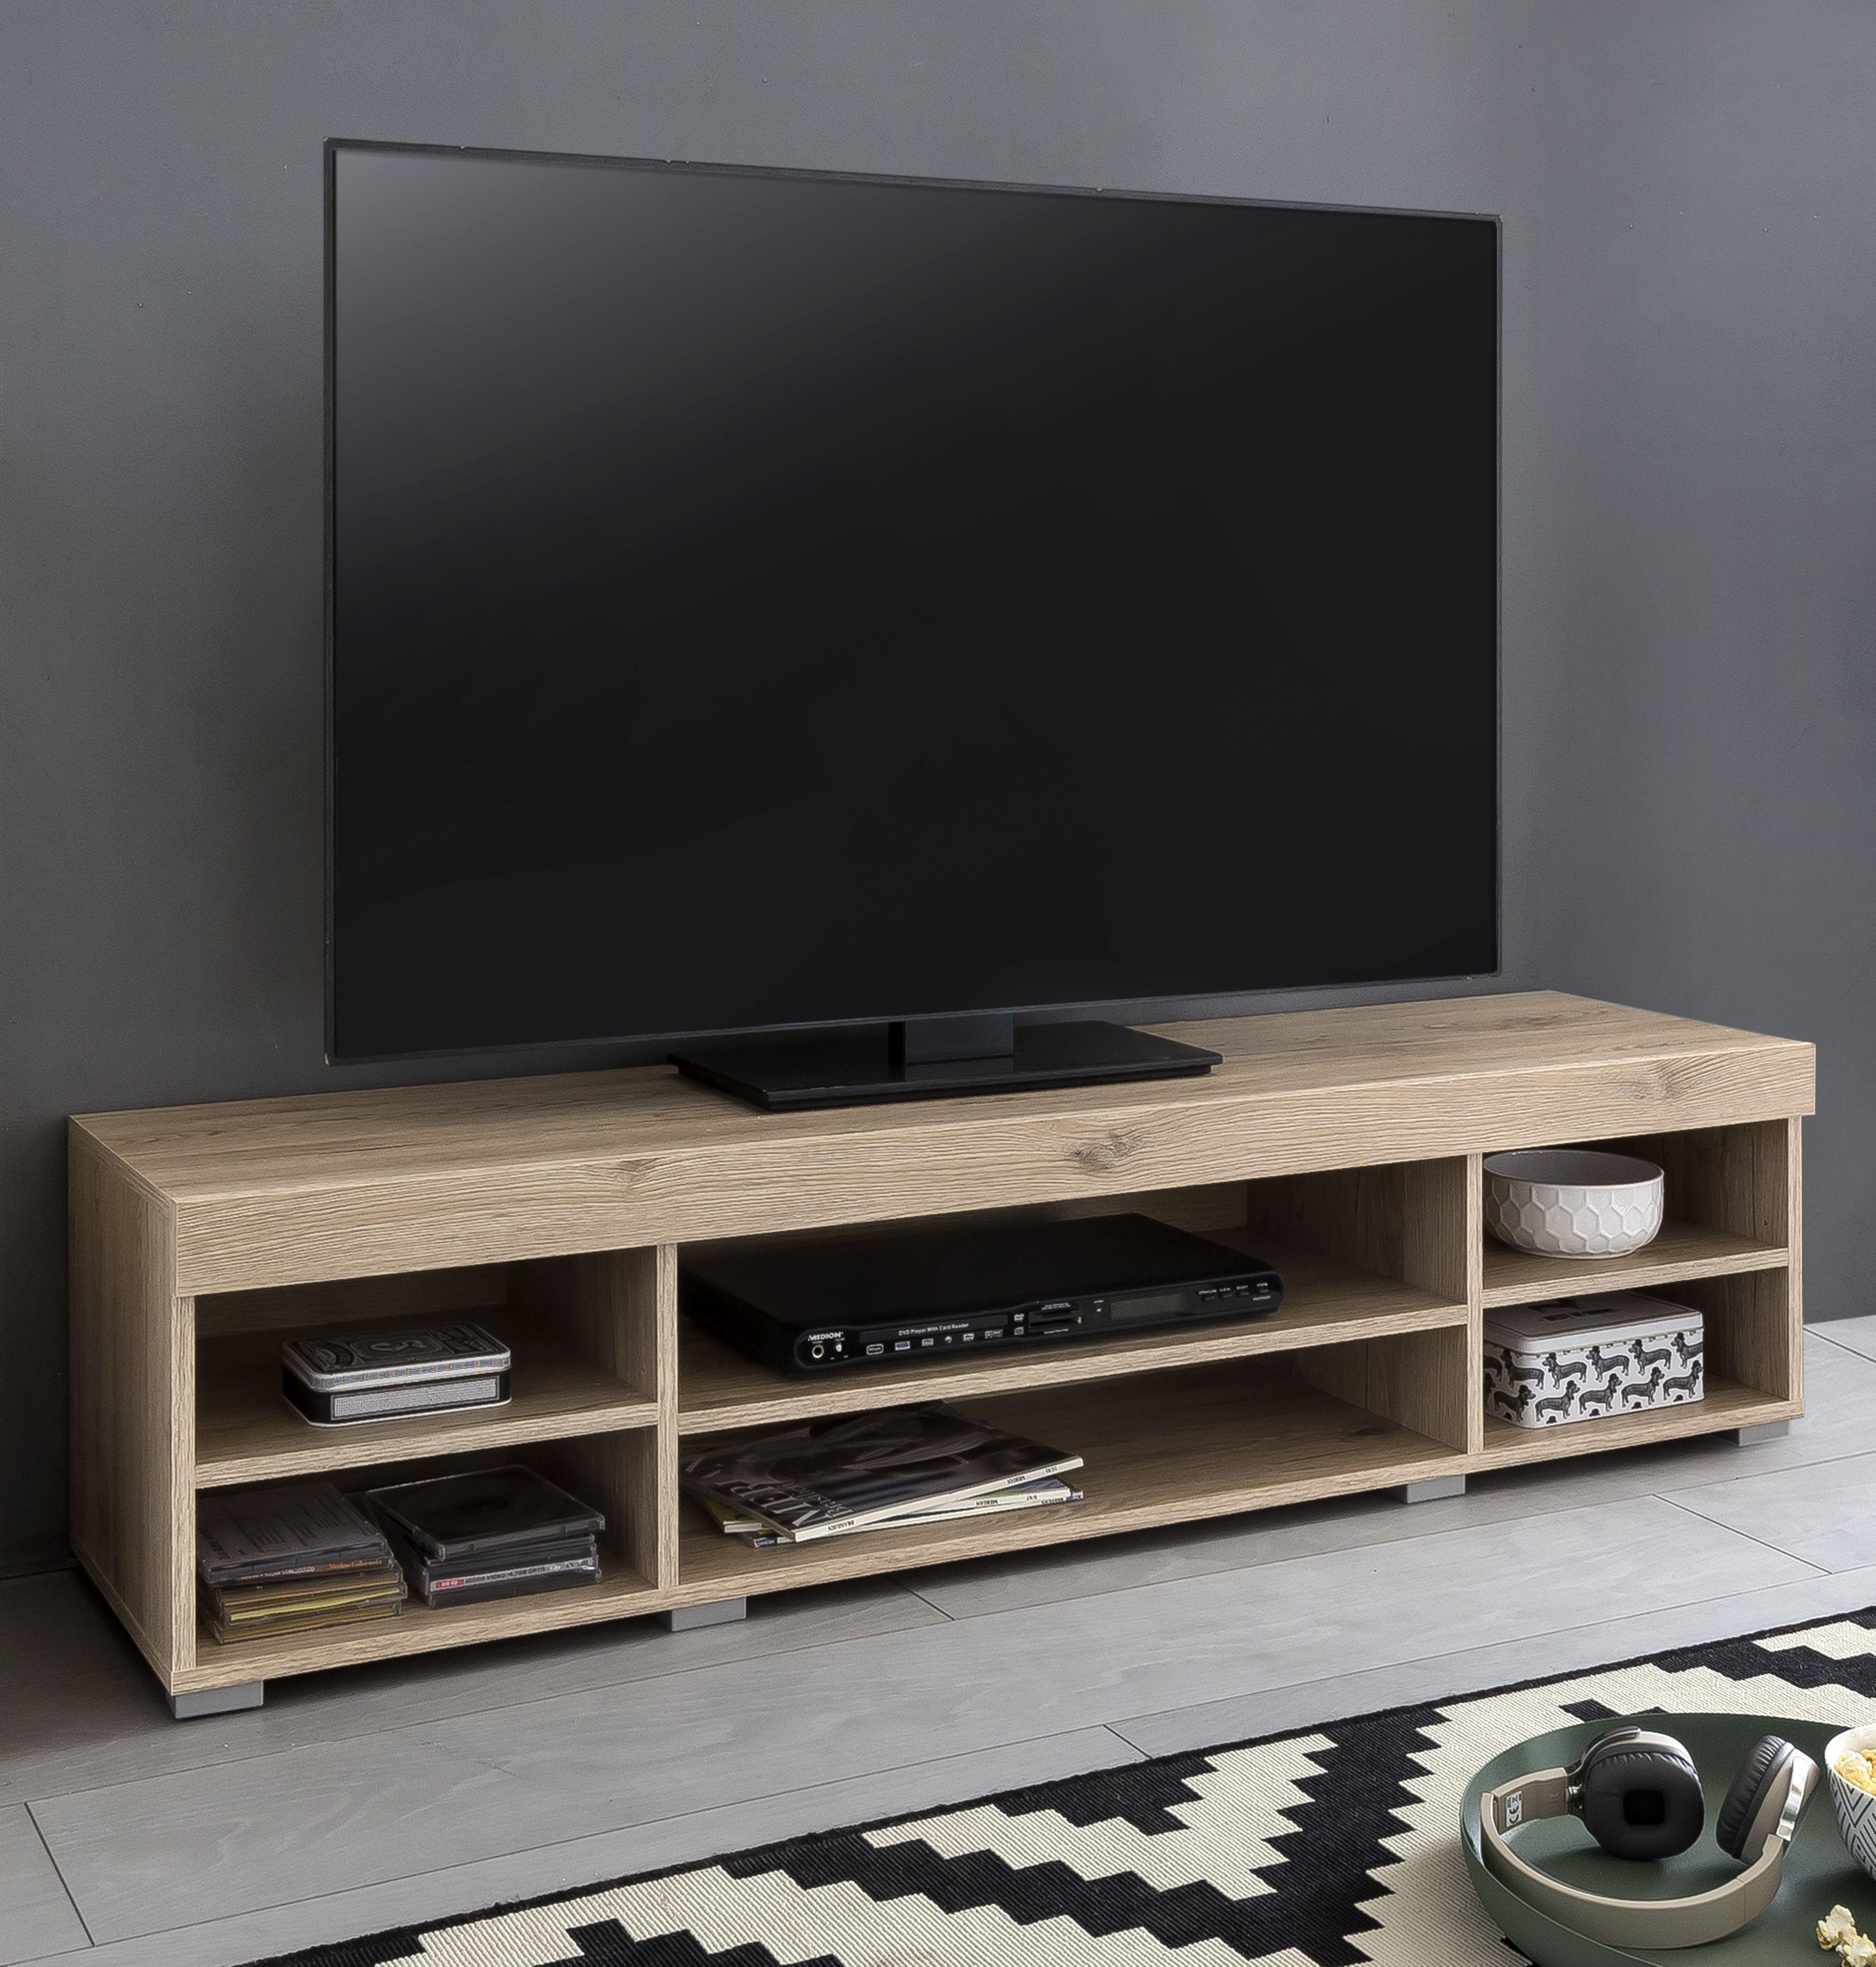 Tv Lowboard Finn In 2020 Wohnen Lowboard Mobel Furs Wohnzimmer